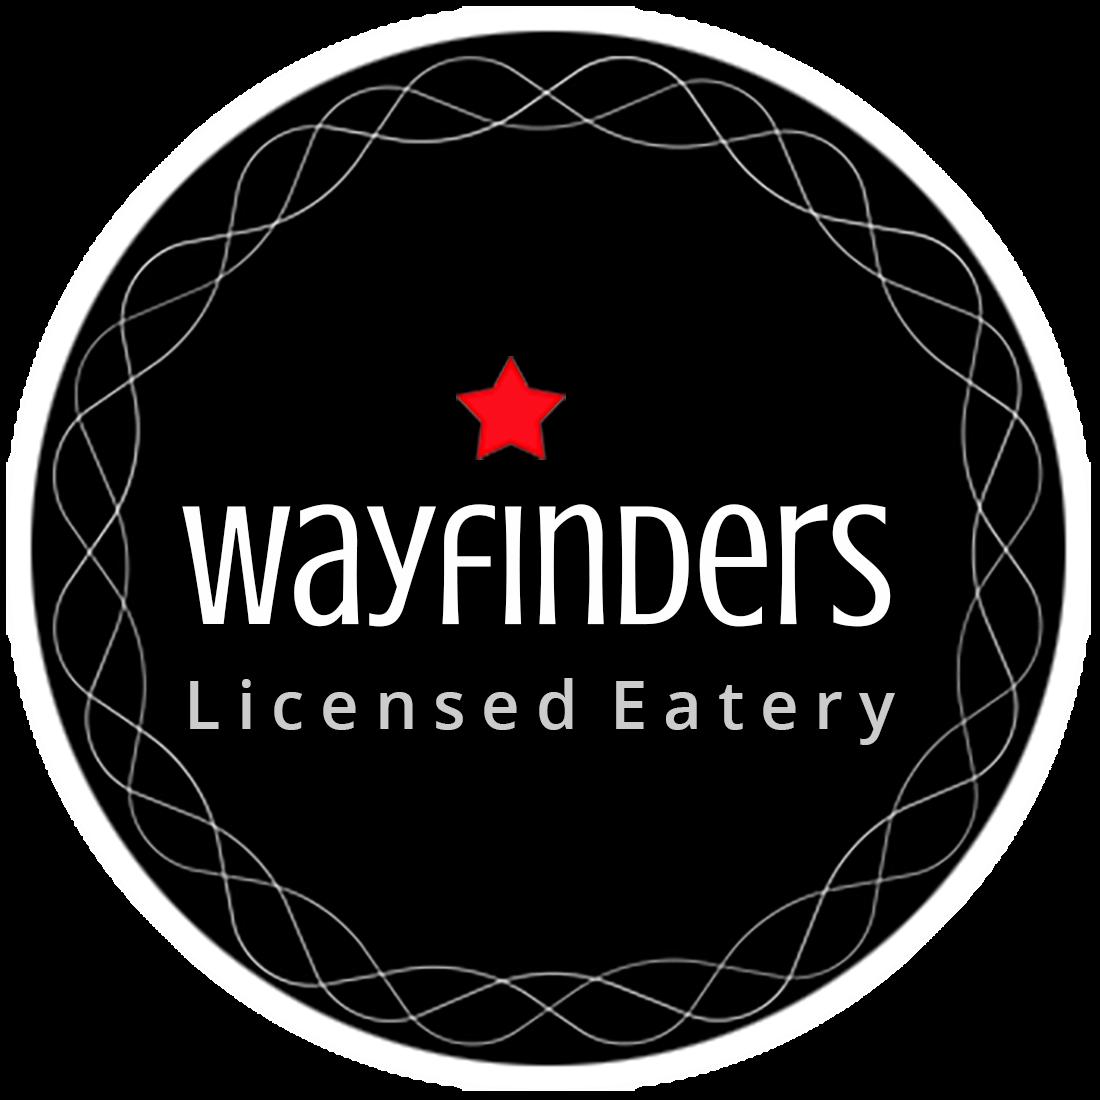 Wayfinders_300dpi smaller.png